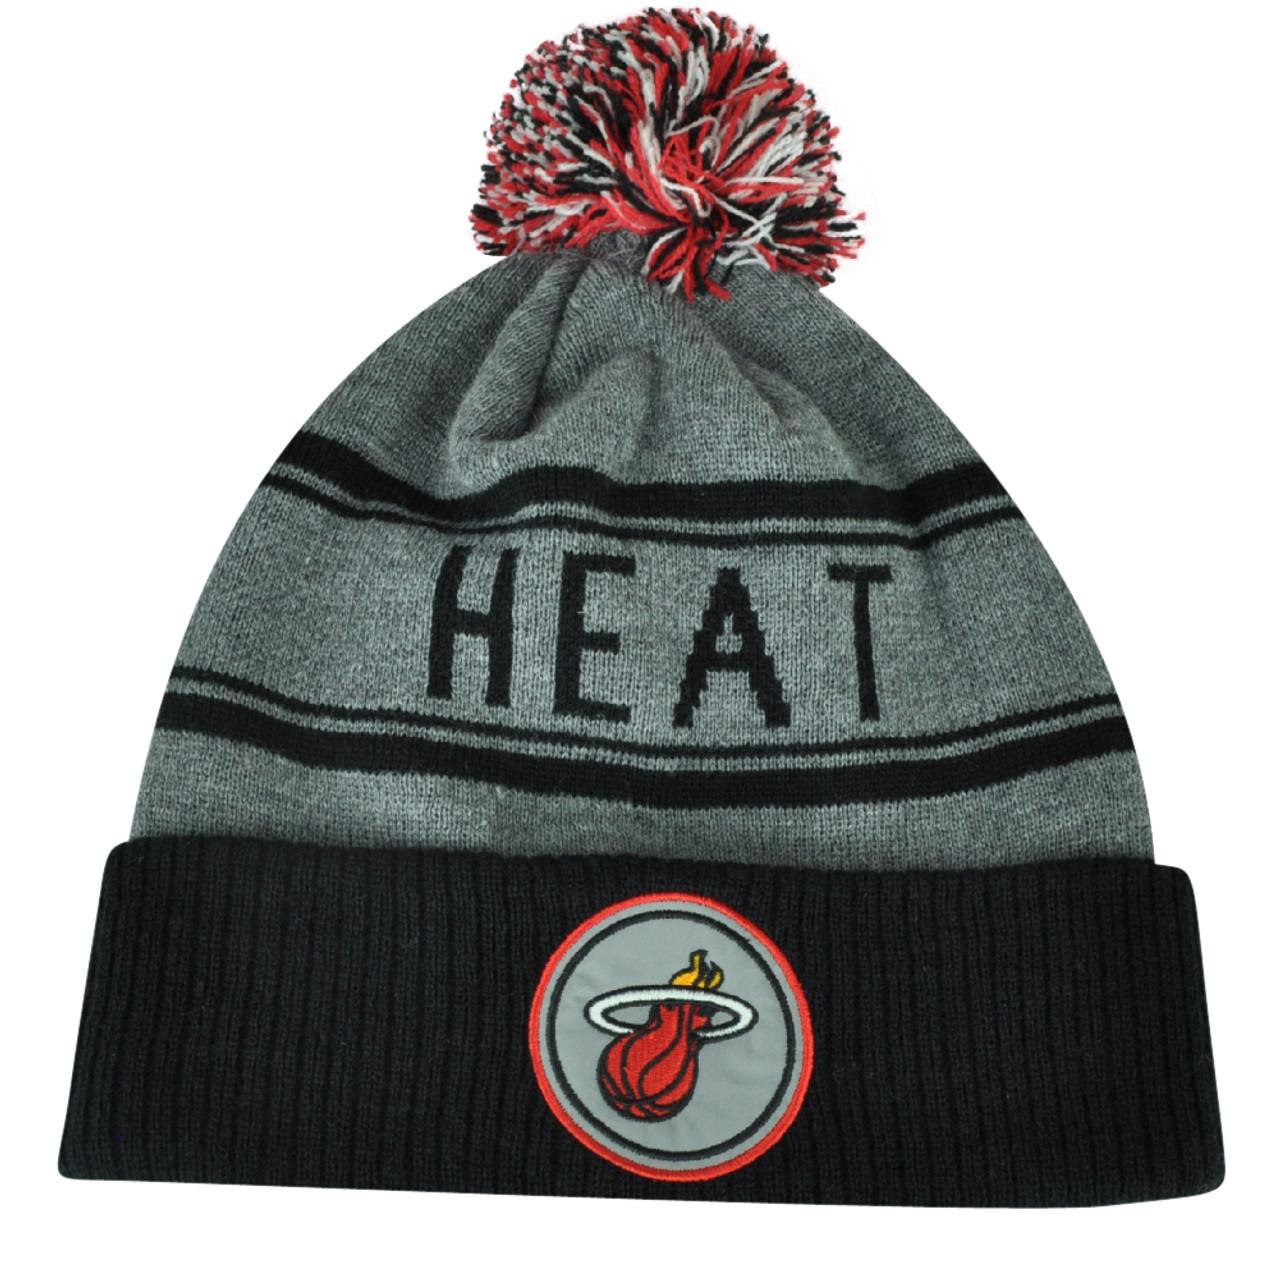 bfaf38ab NBA Adidas Miami Heat Cuffed Pom Pom Striped Knit Beanie Hat Toque Gray  Winter - Cap Store Online.com